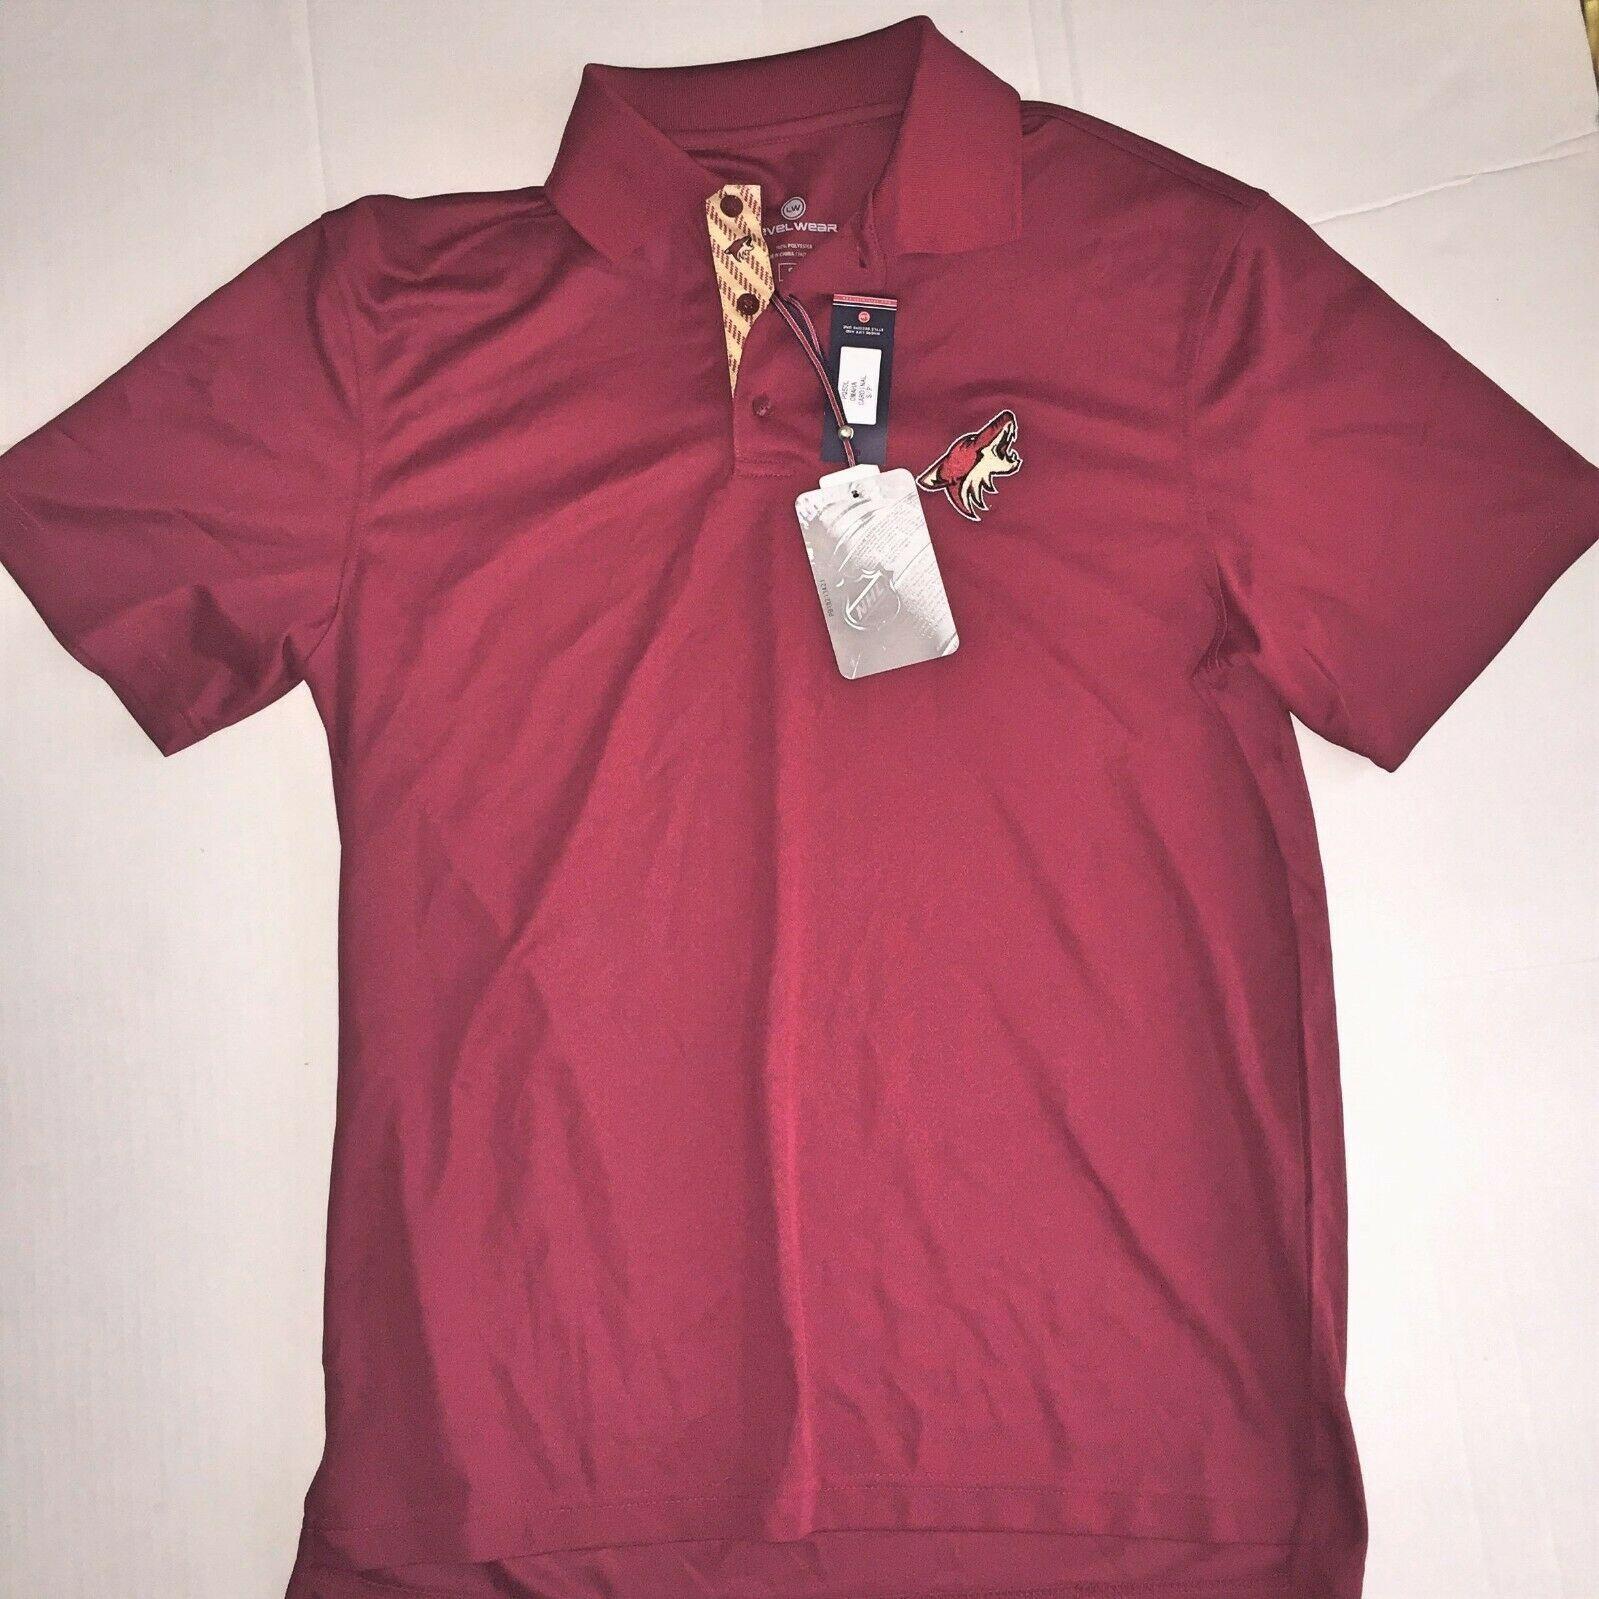 Mens Small NHL Arizona Coyotes Polo Shirt S NEW - $29.99